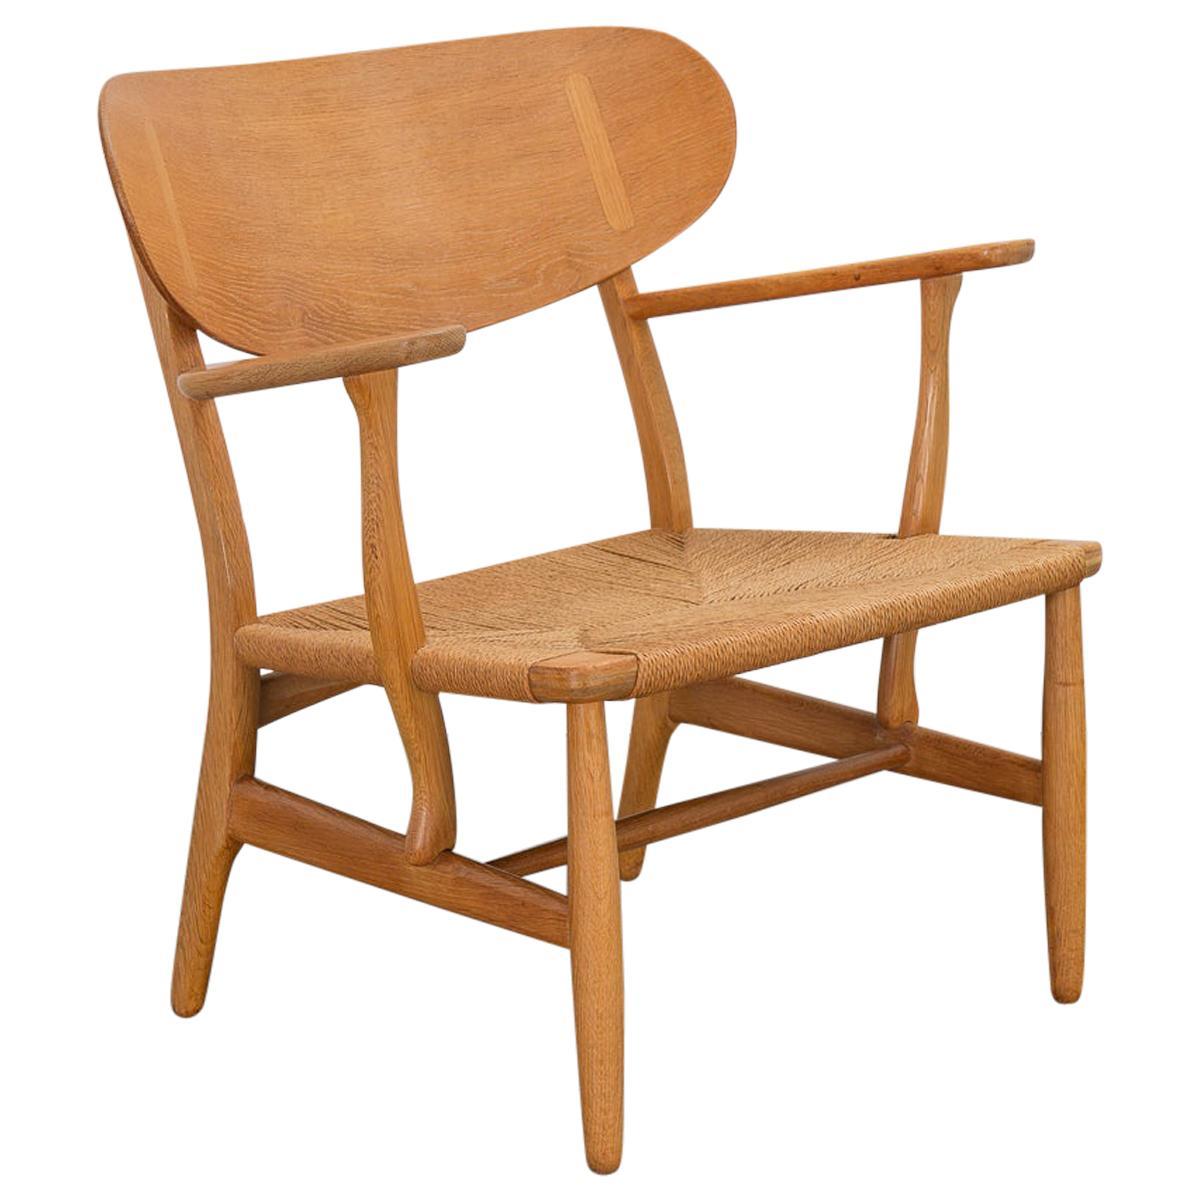 Hans Wegner CH 22 Chair for Carl Hansen & Son